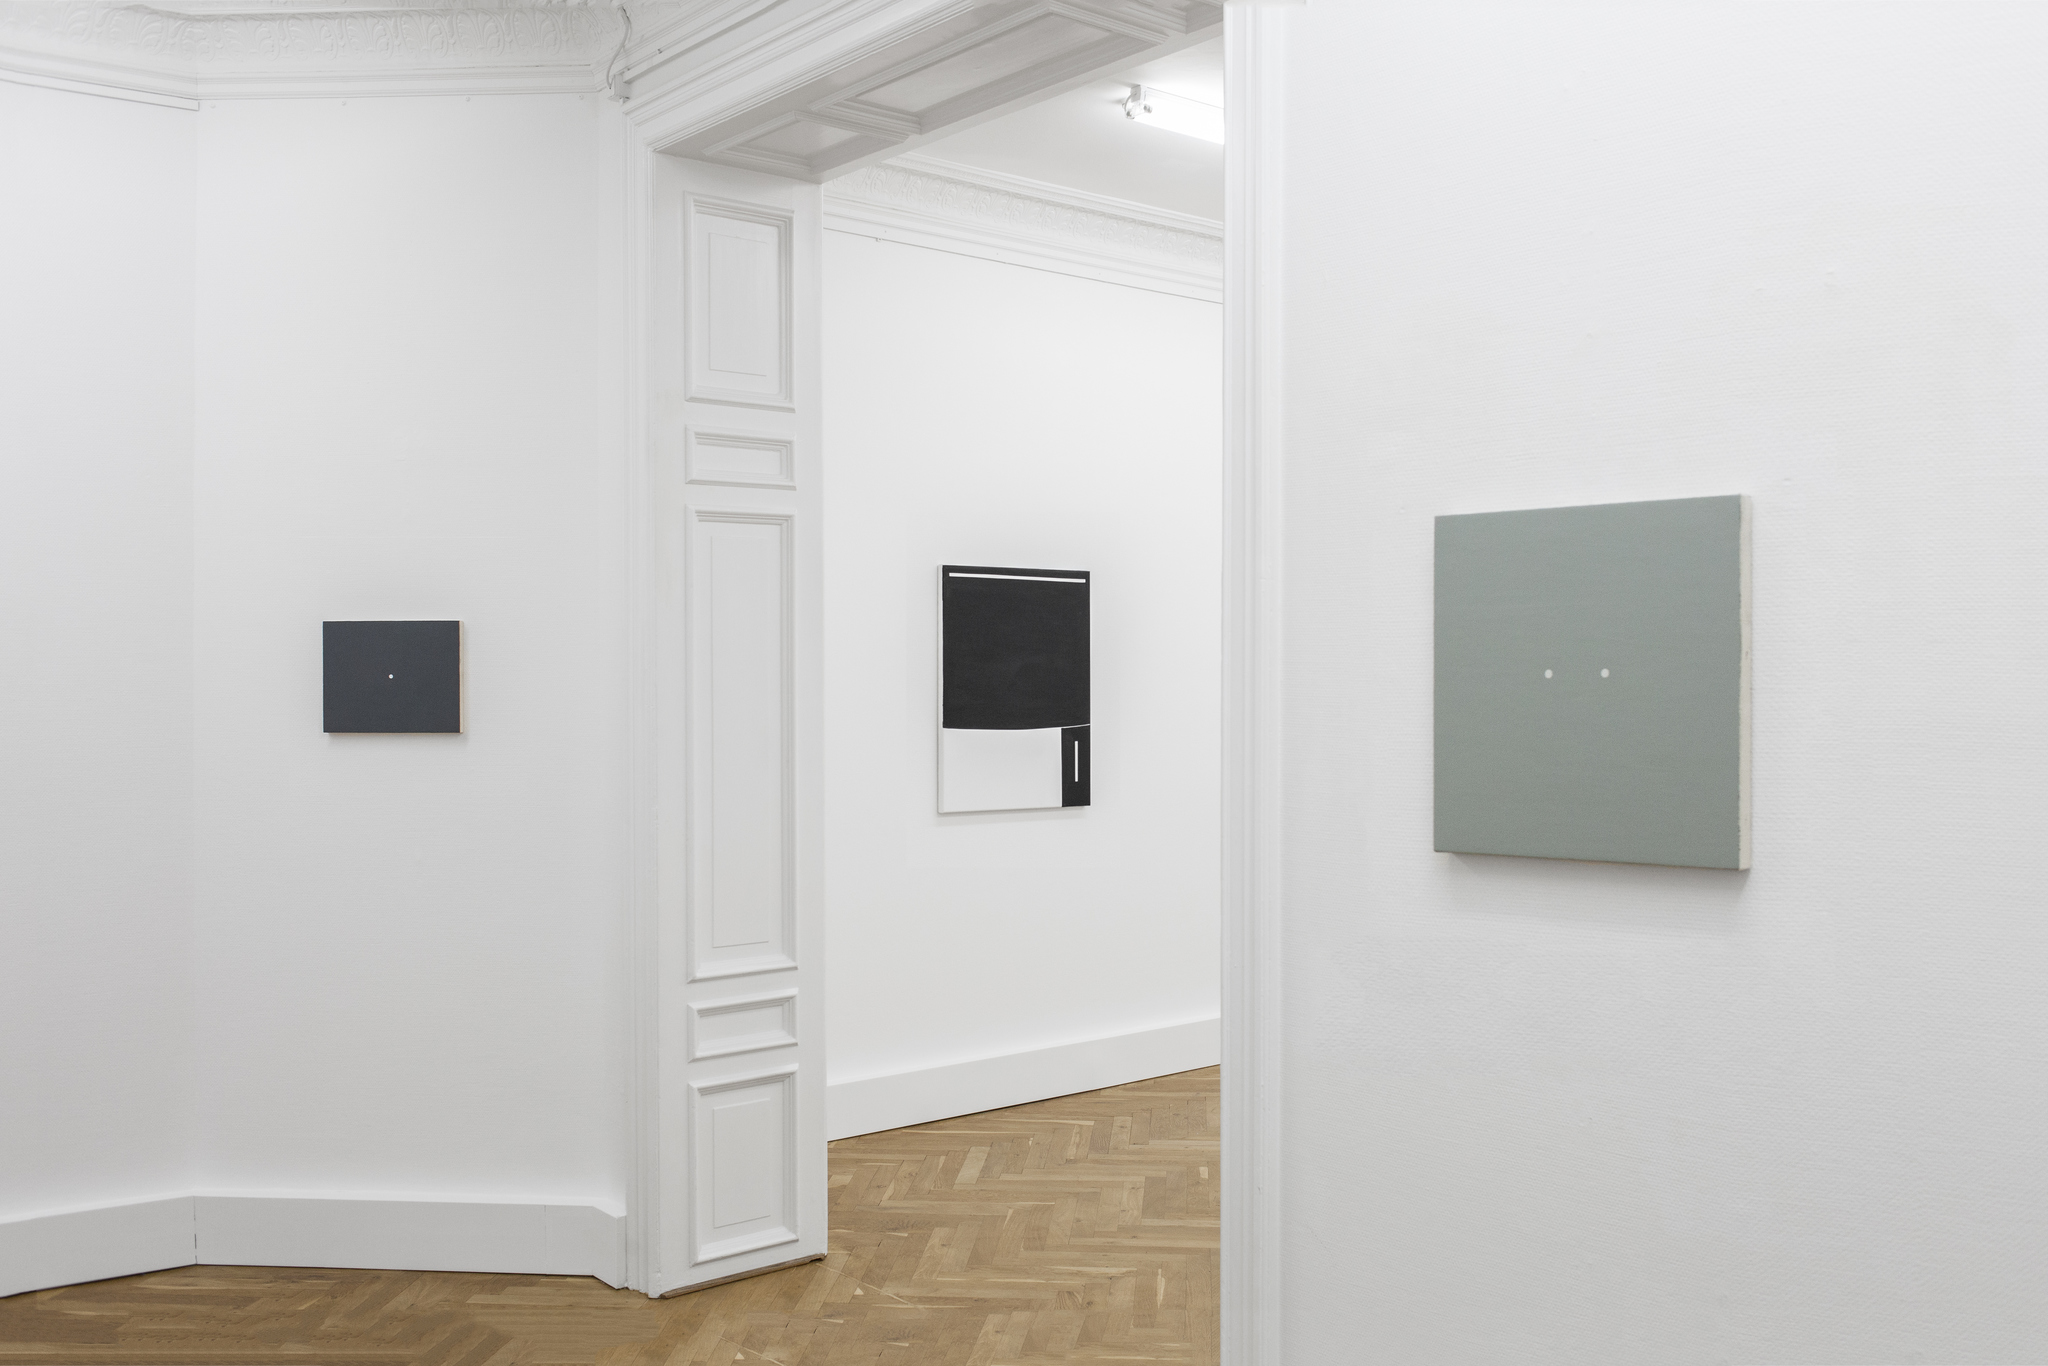 1-2-andre-butzer-matthew-feyld-sundays-gallery